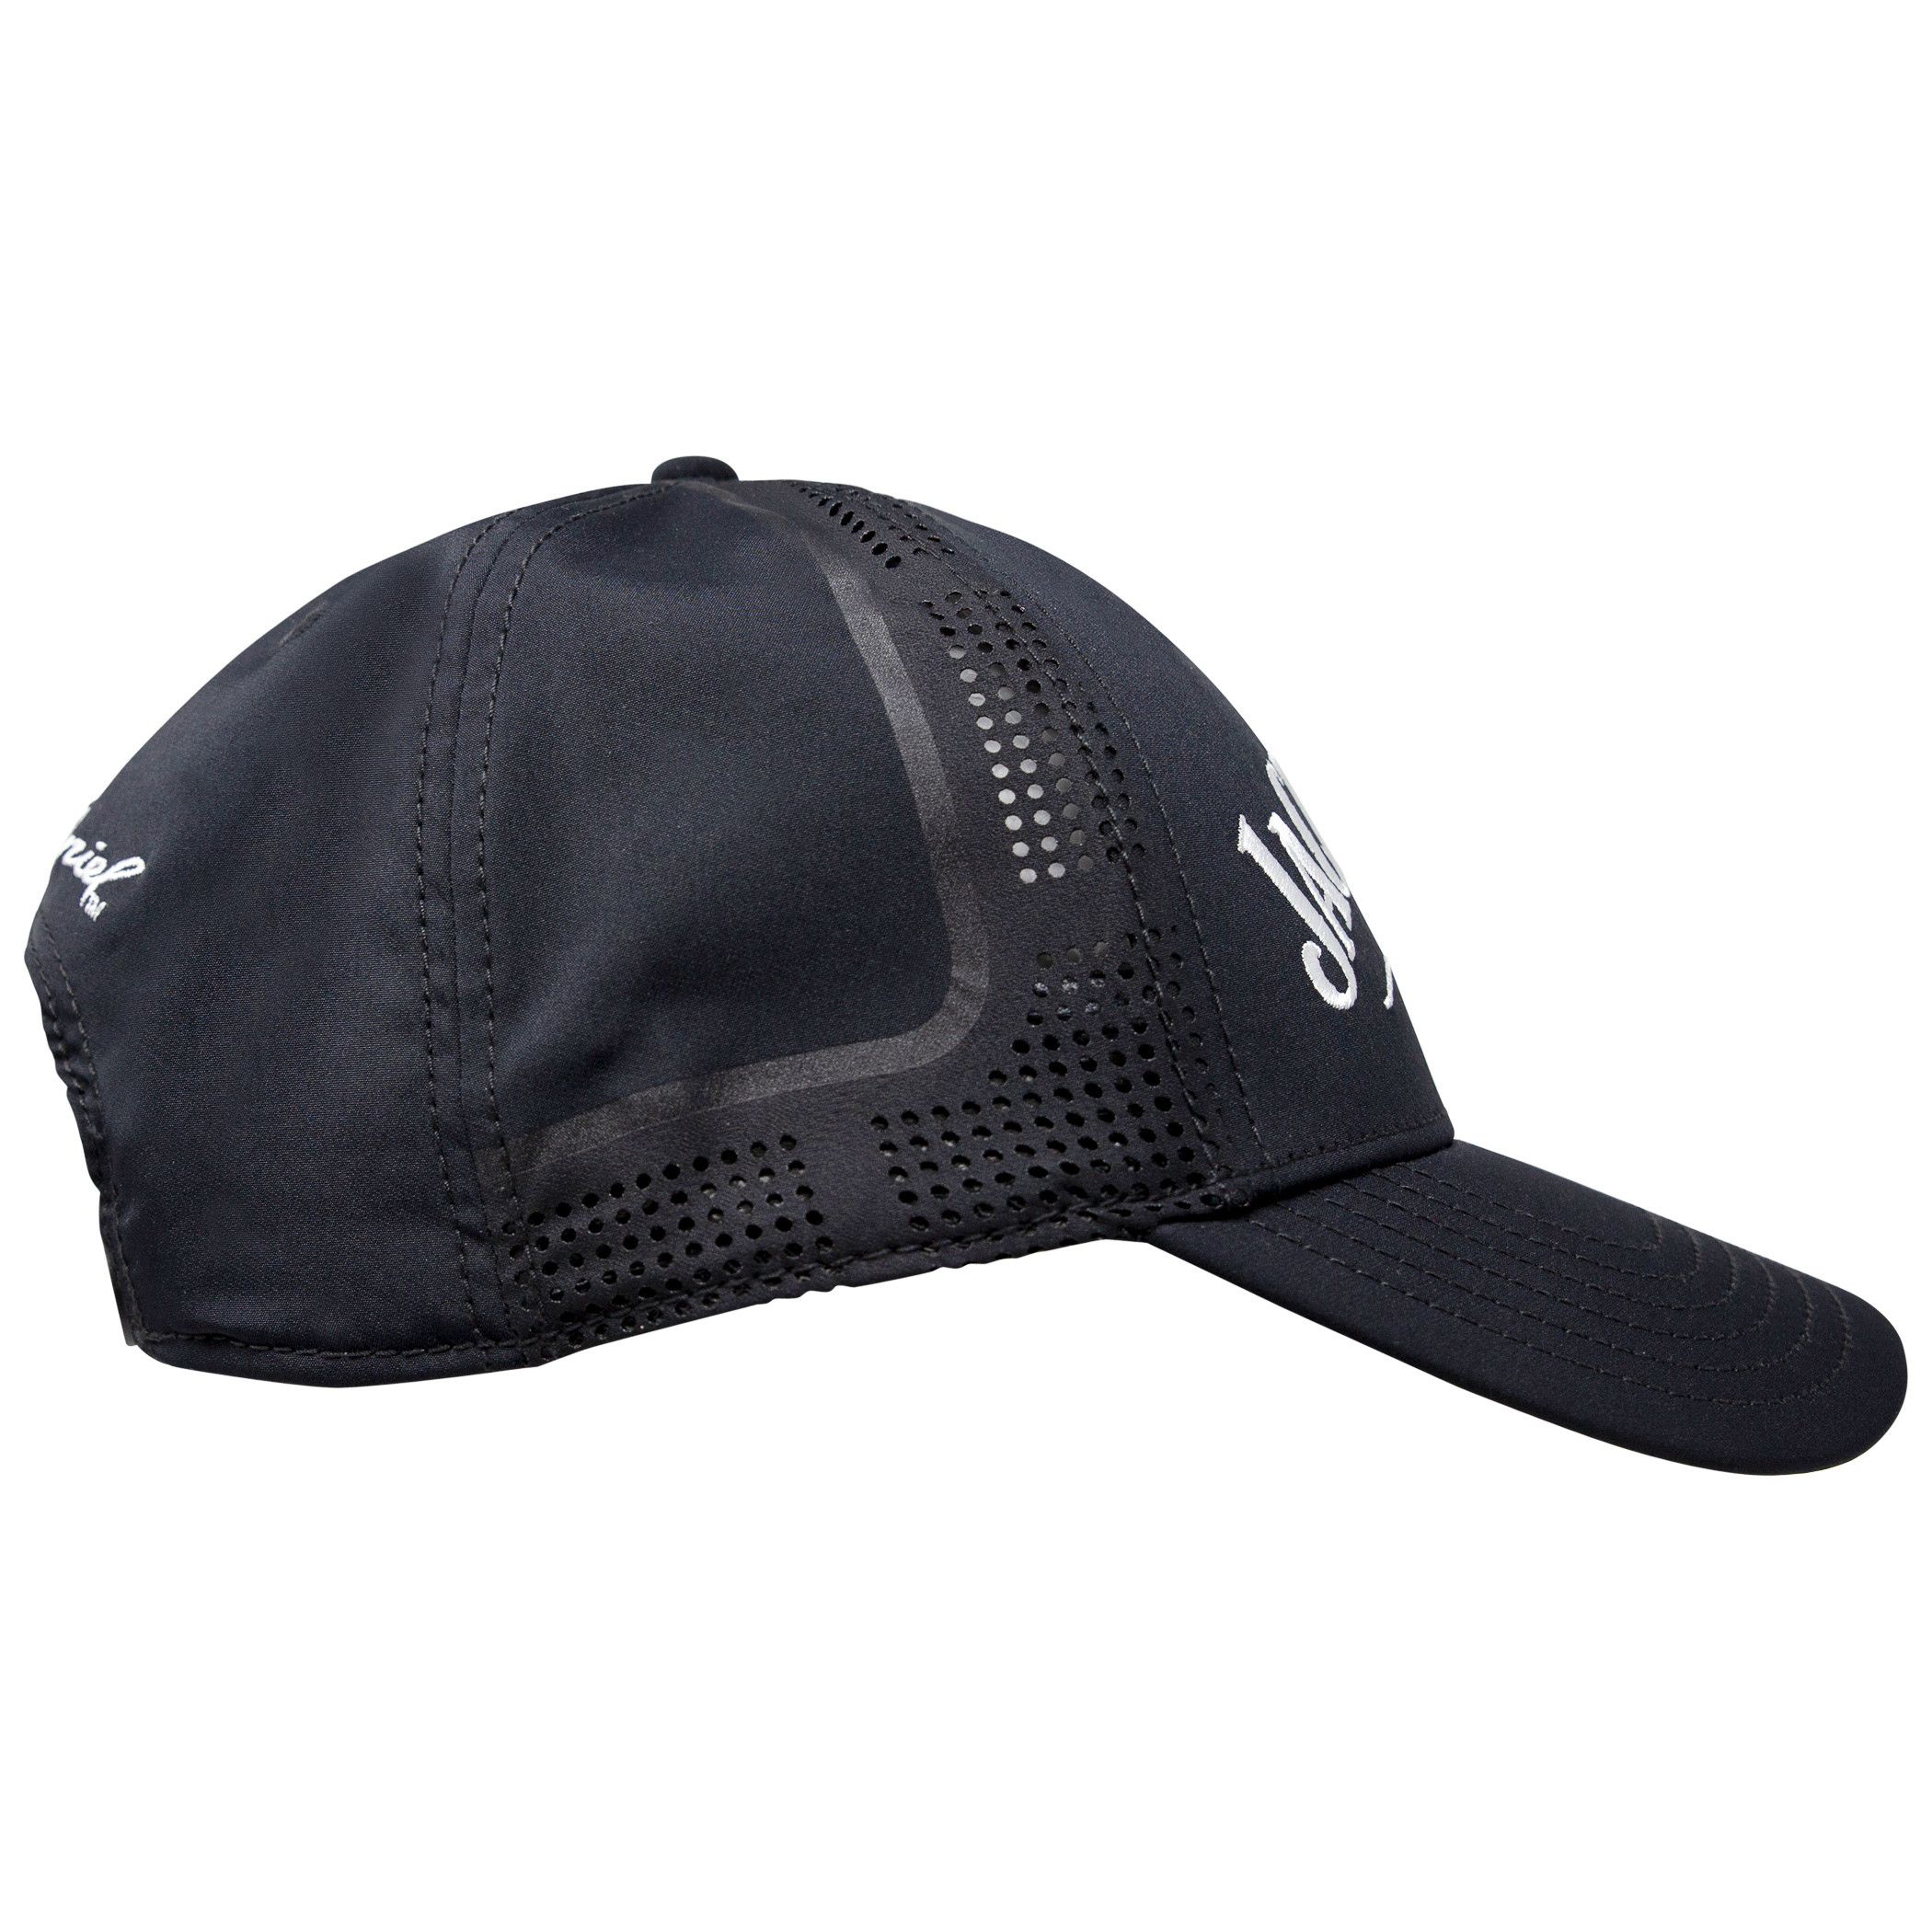 Jack Daniels Black Performance Hat